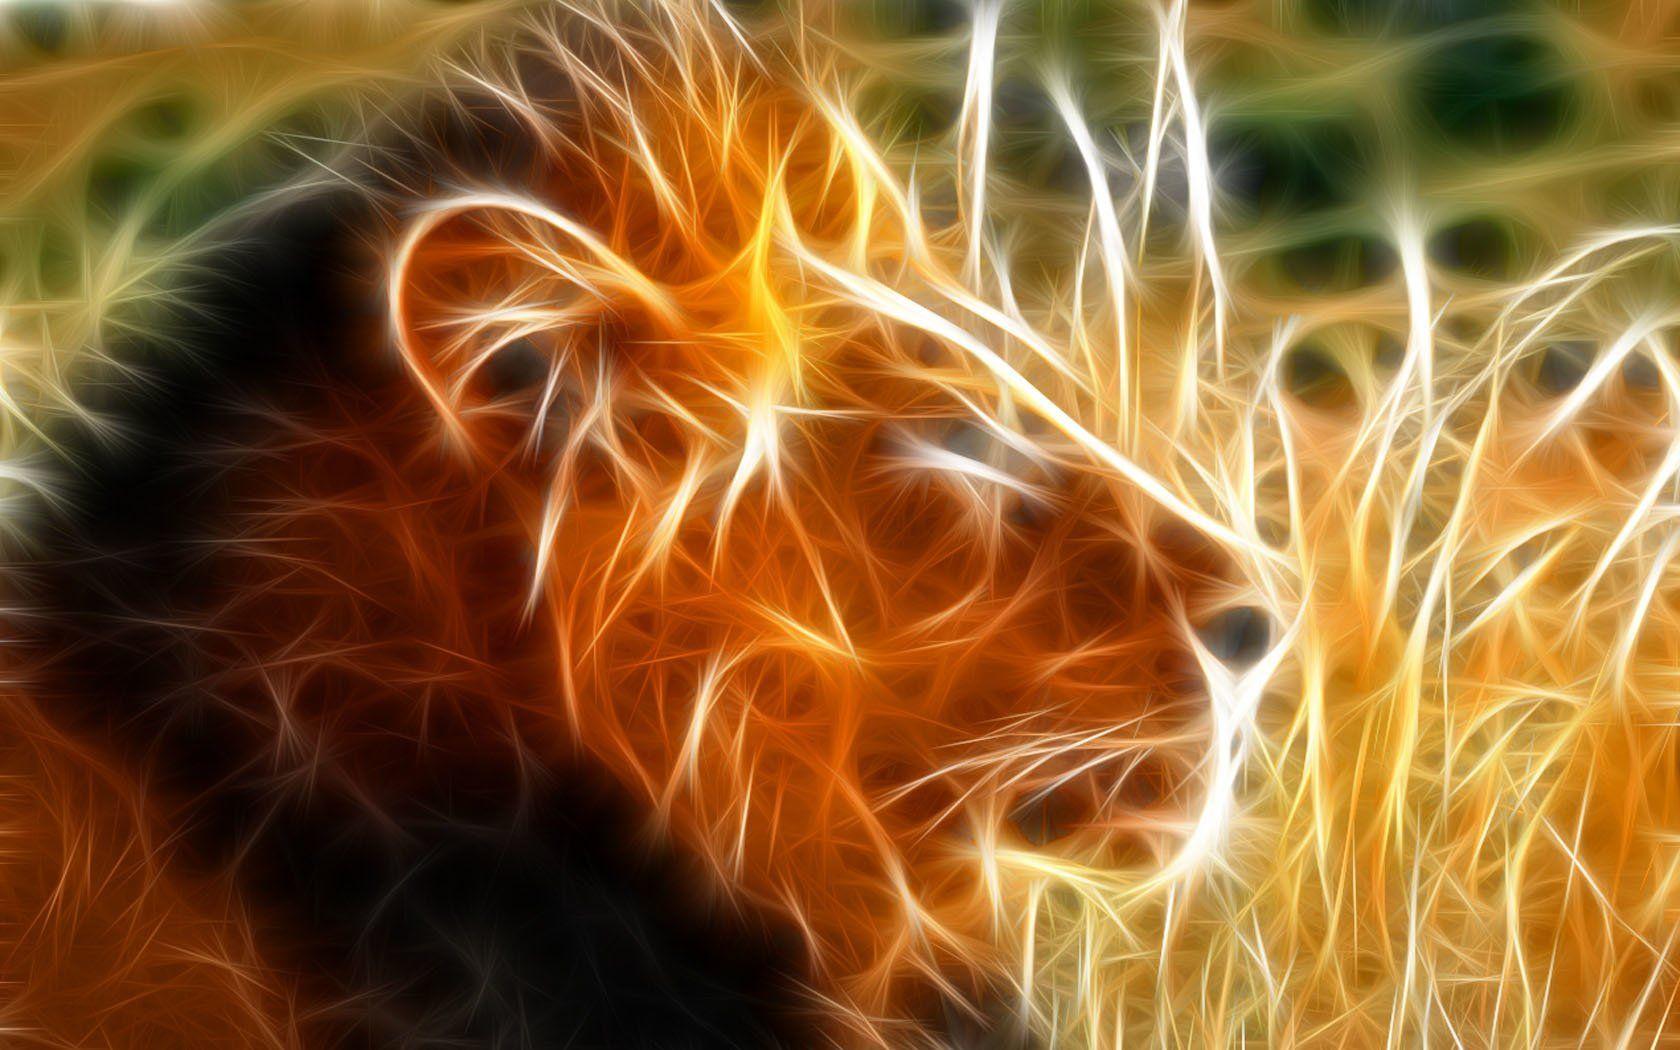 Hd wallpaper lion - Lion Wallpapers Free Download New Wild Animals Cub Hd Desktop Images